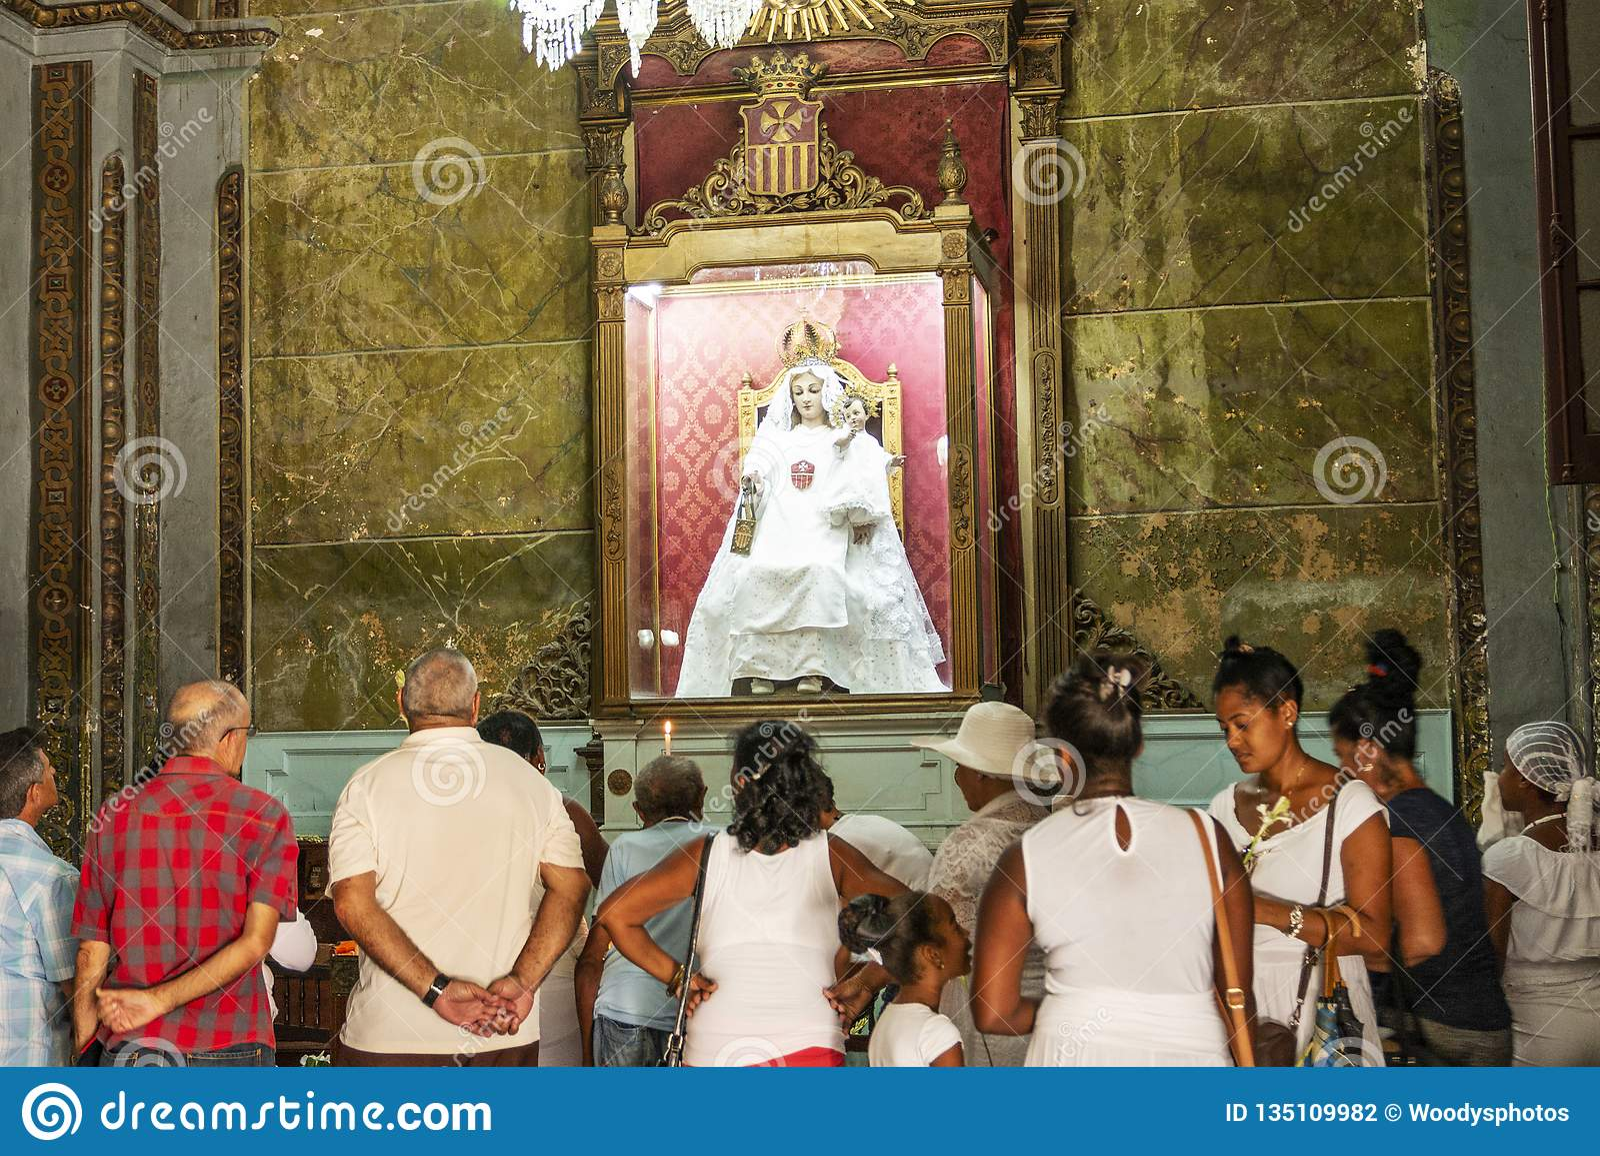 People praying in Havana Cuba church